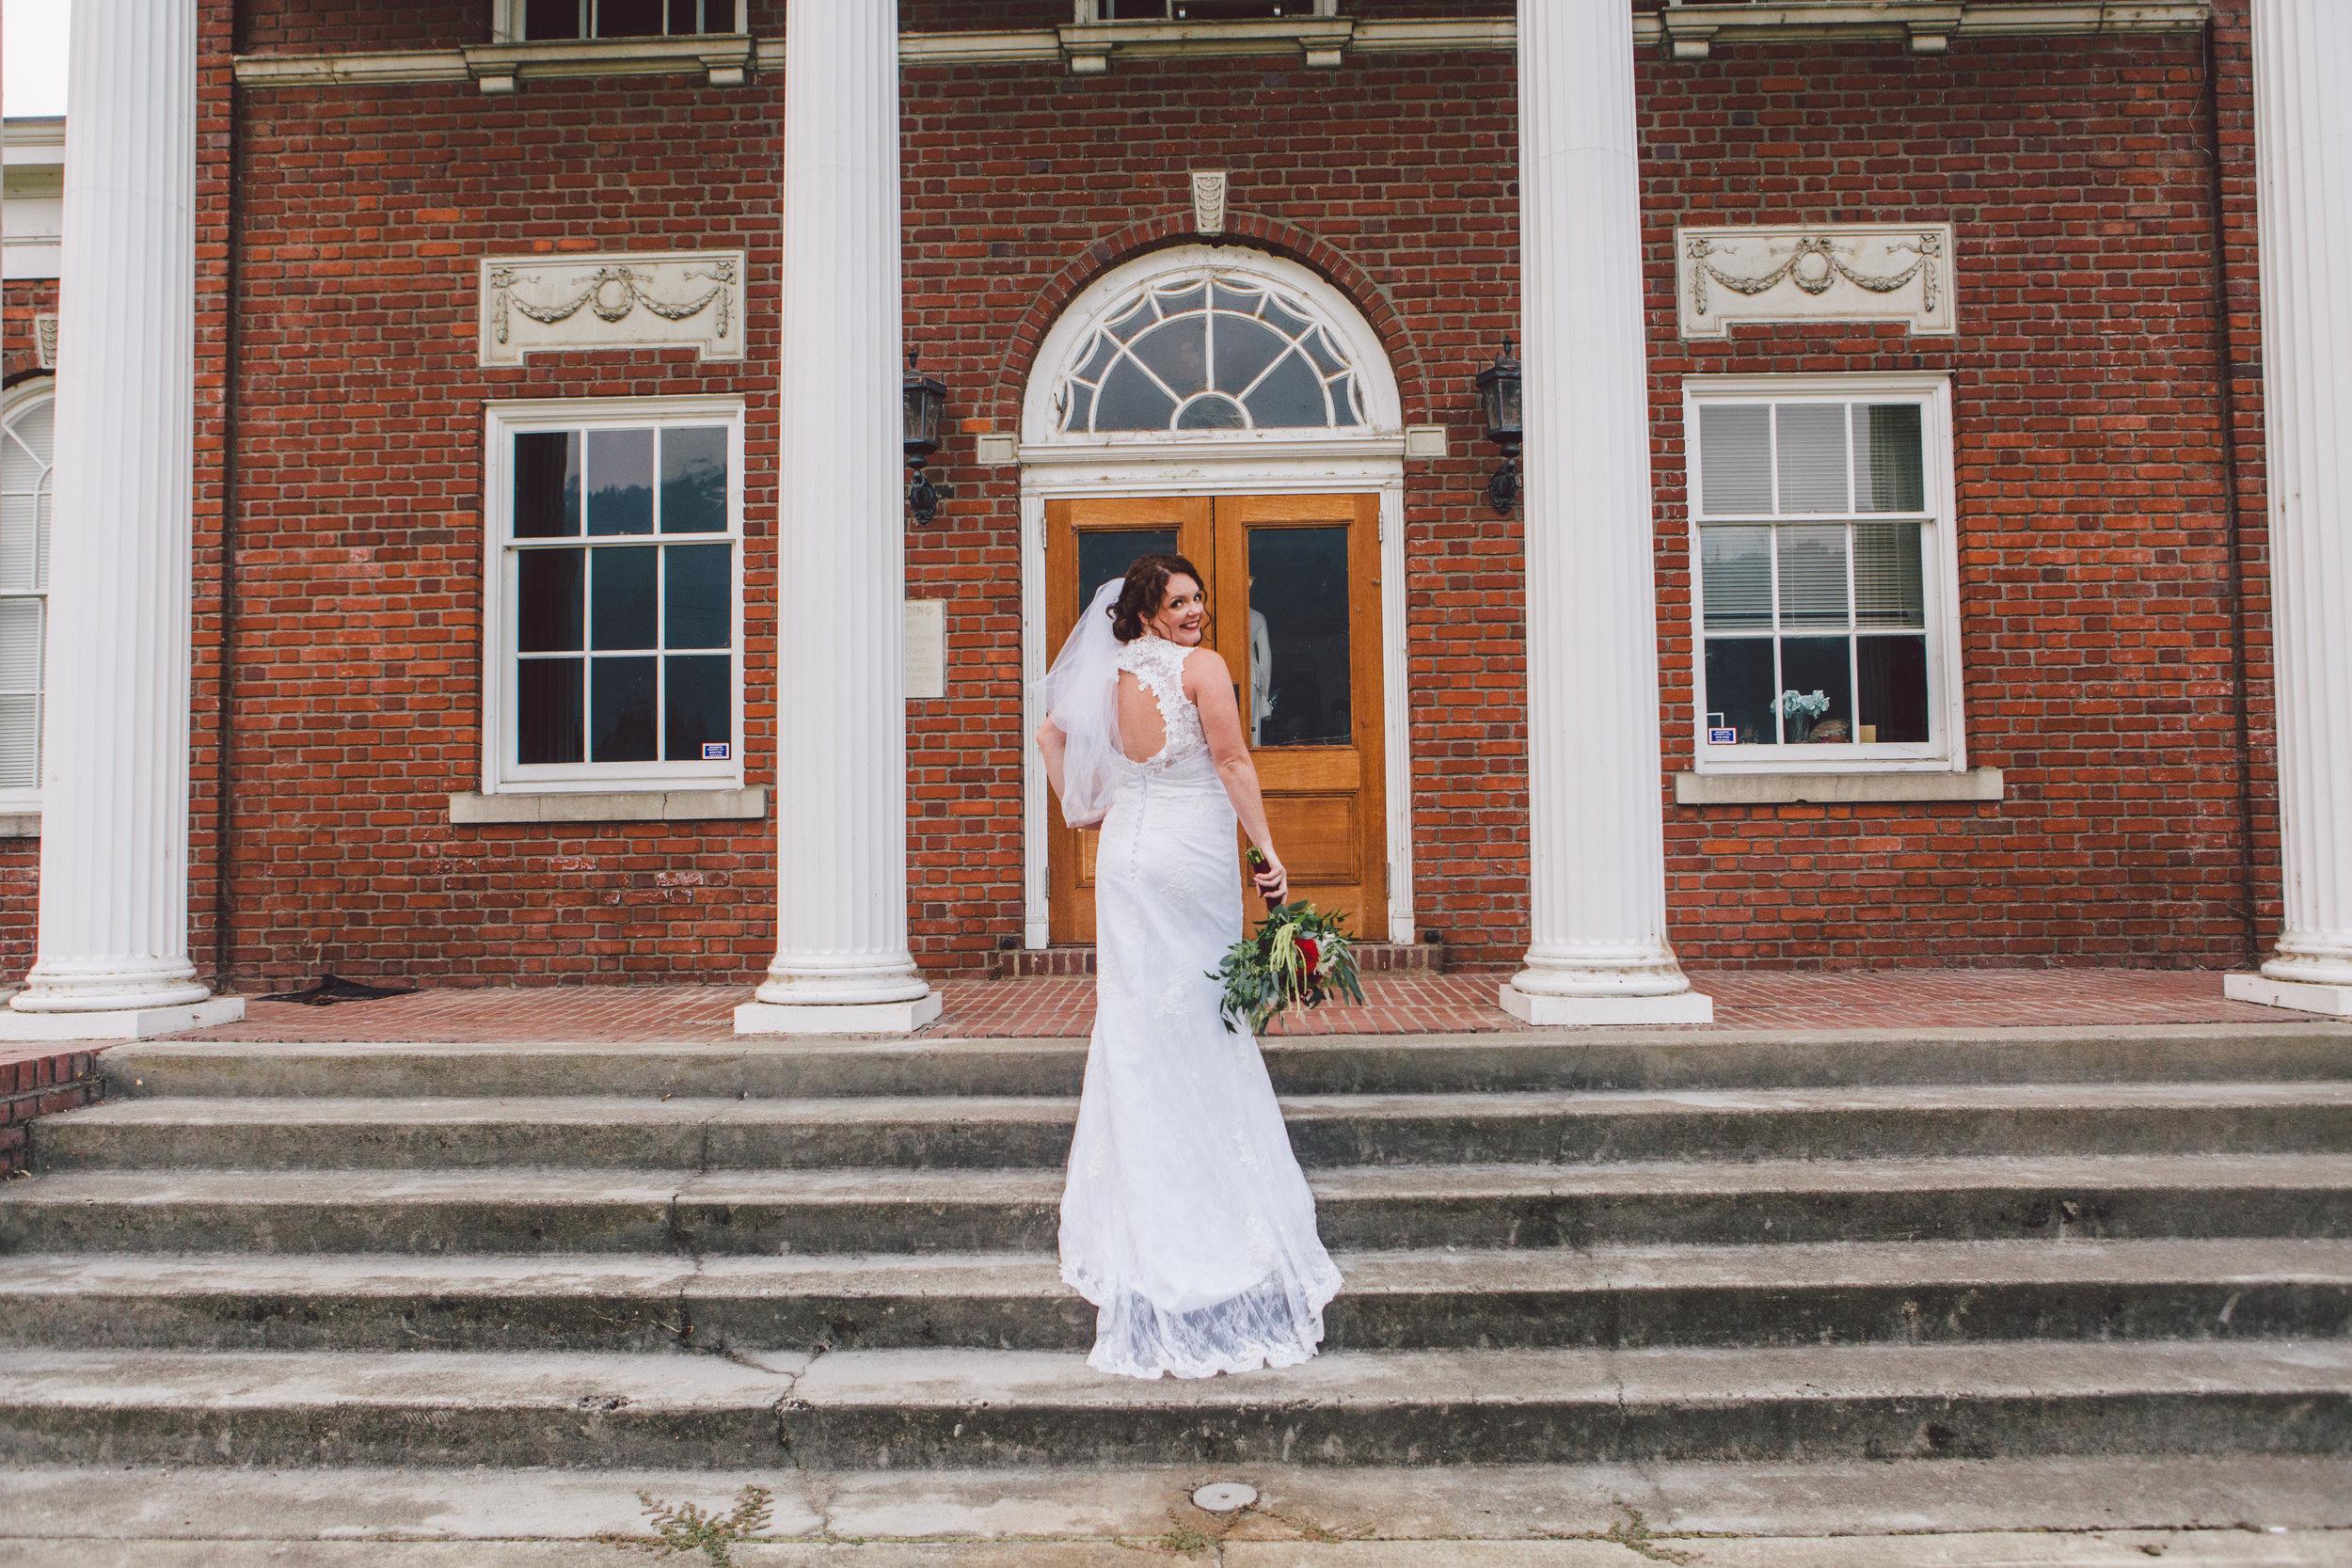 Kincheloe_Hutchings Wedding 2017 (722).jpg